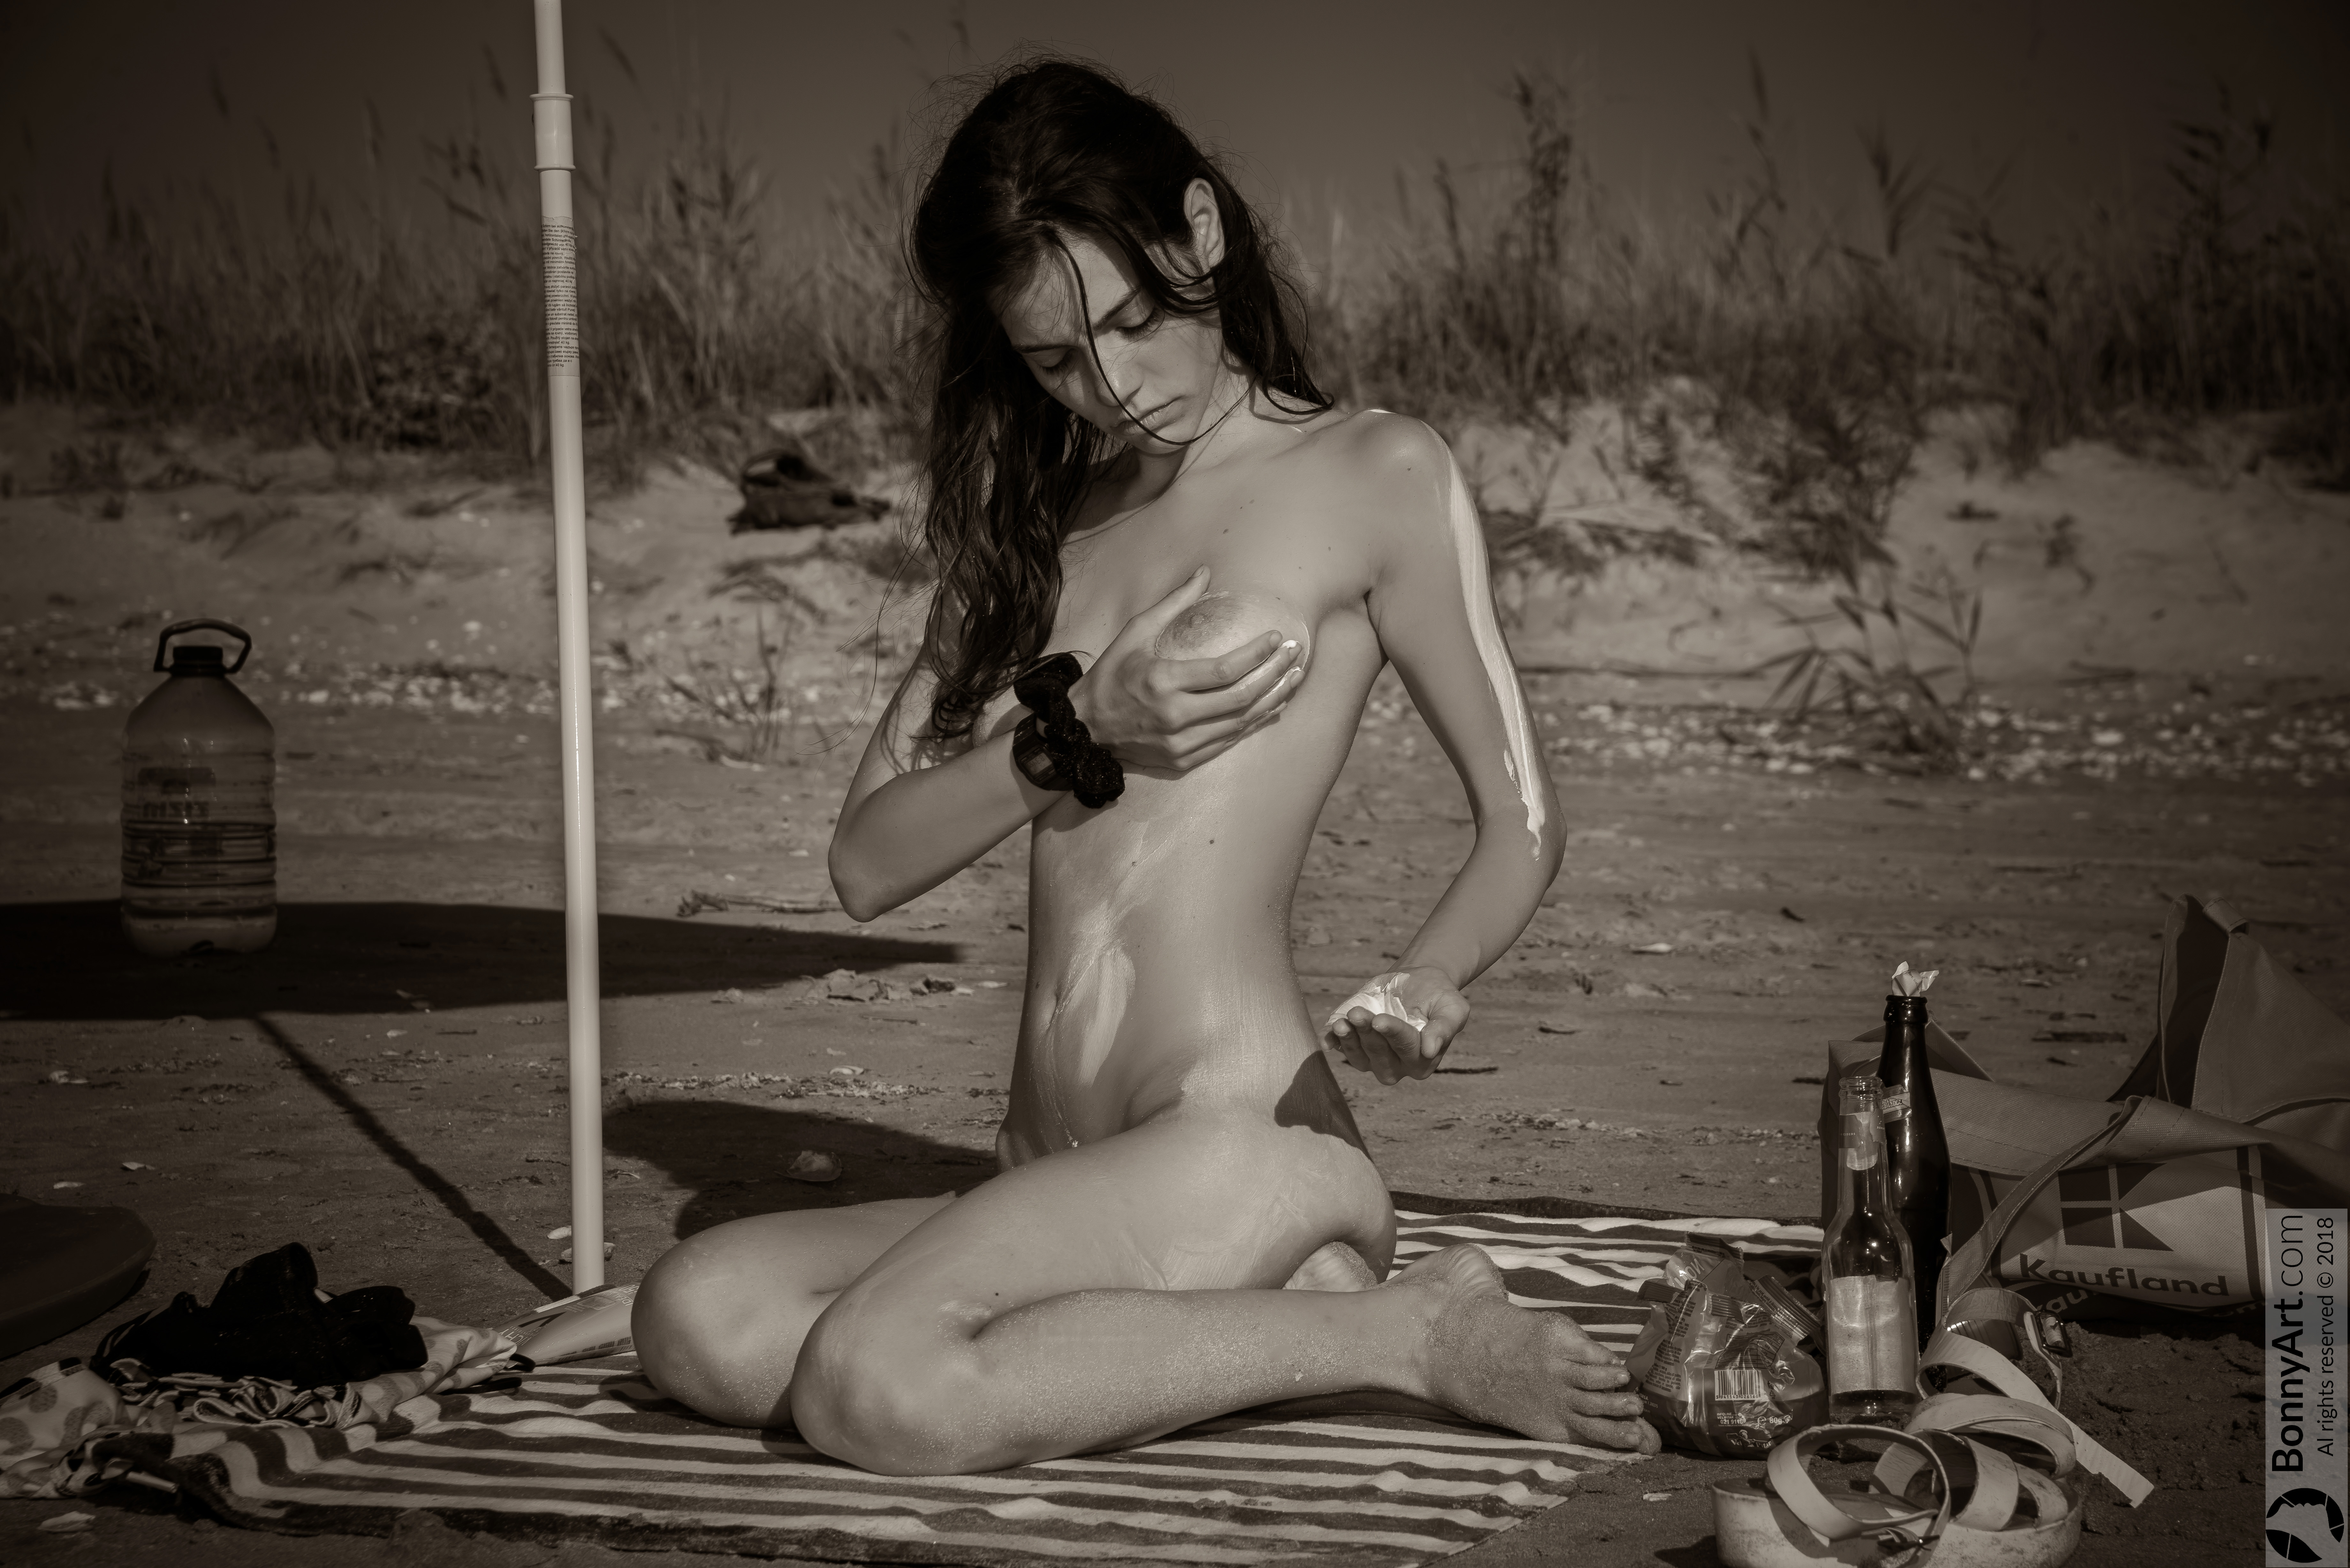 Vintage Nudist Beautiful Girl on Beach Using Sunscreen